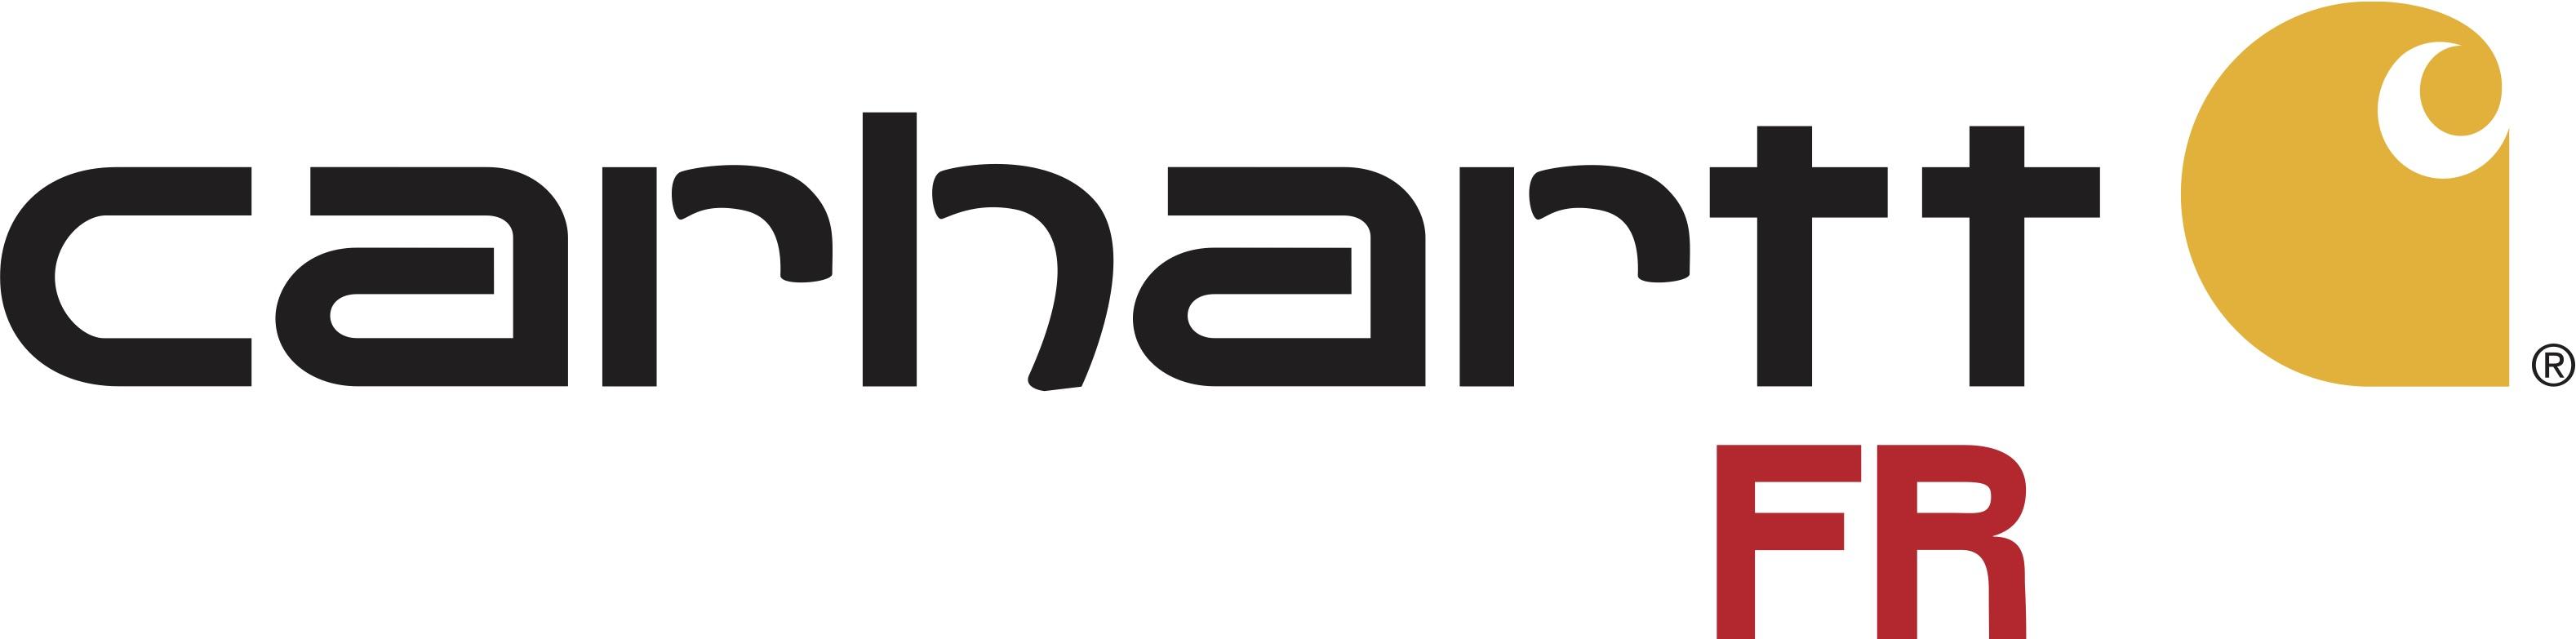 CarharttFR_logo.jpg